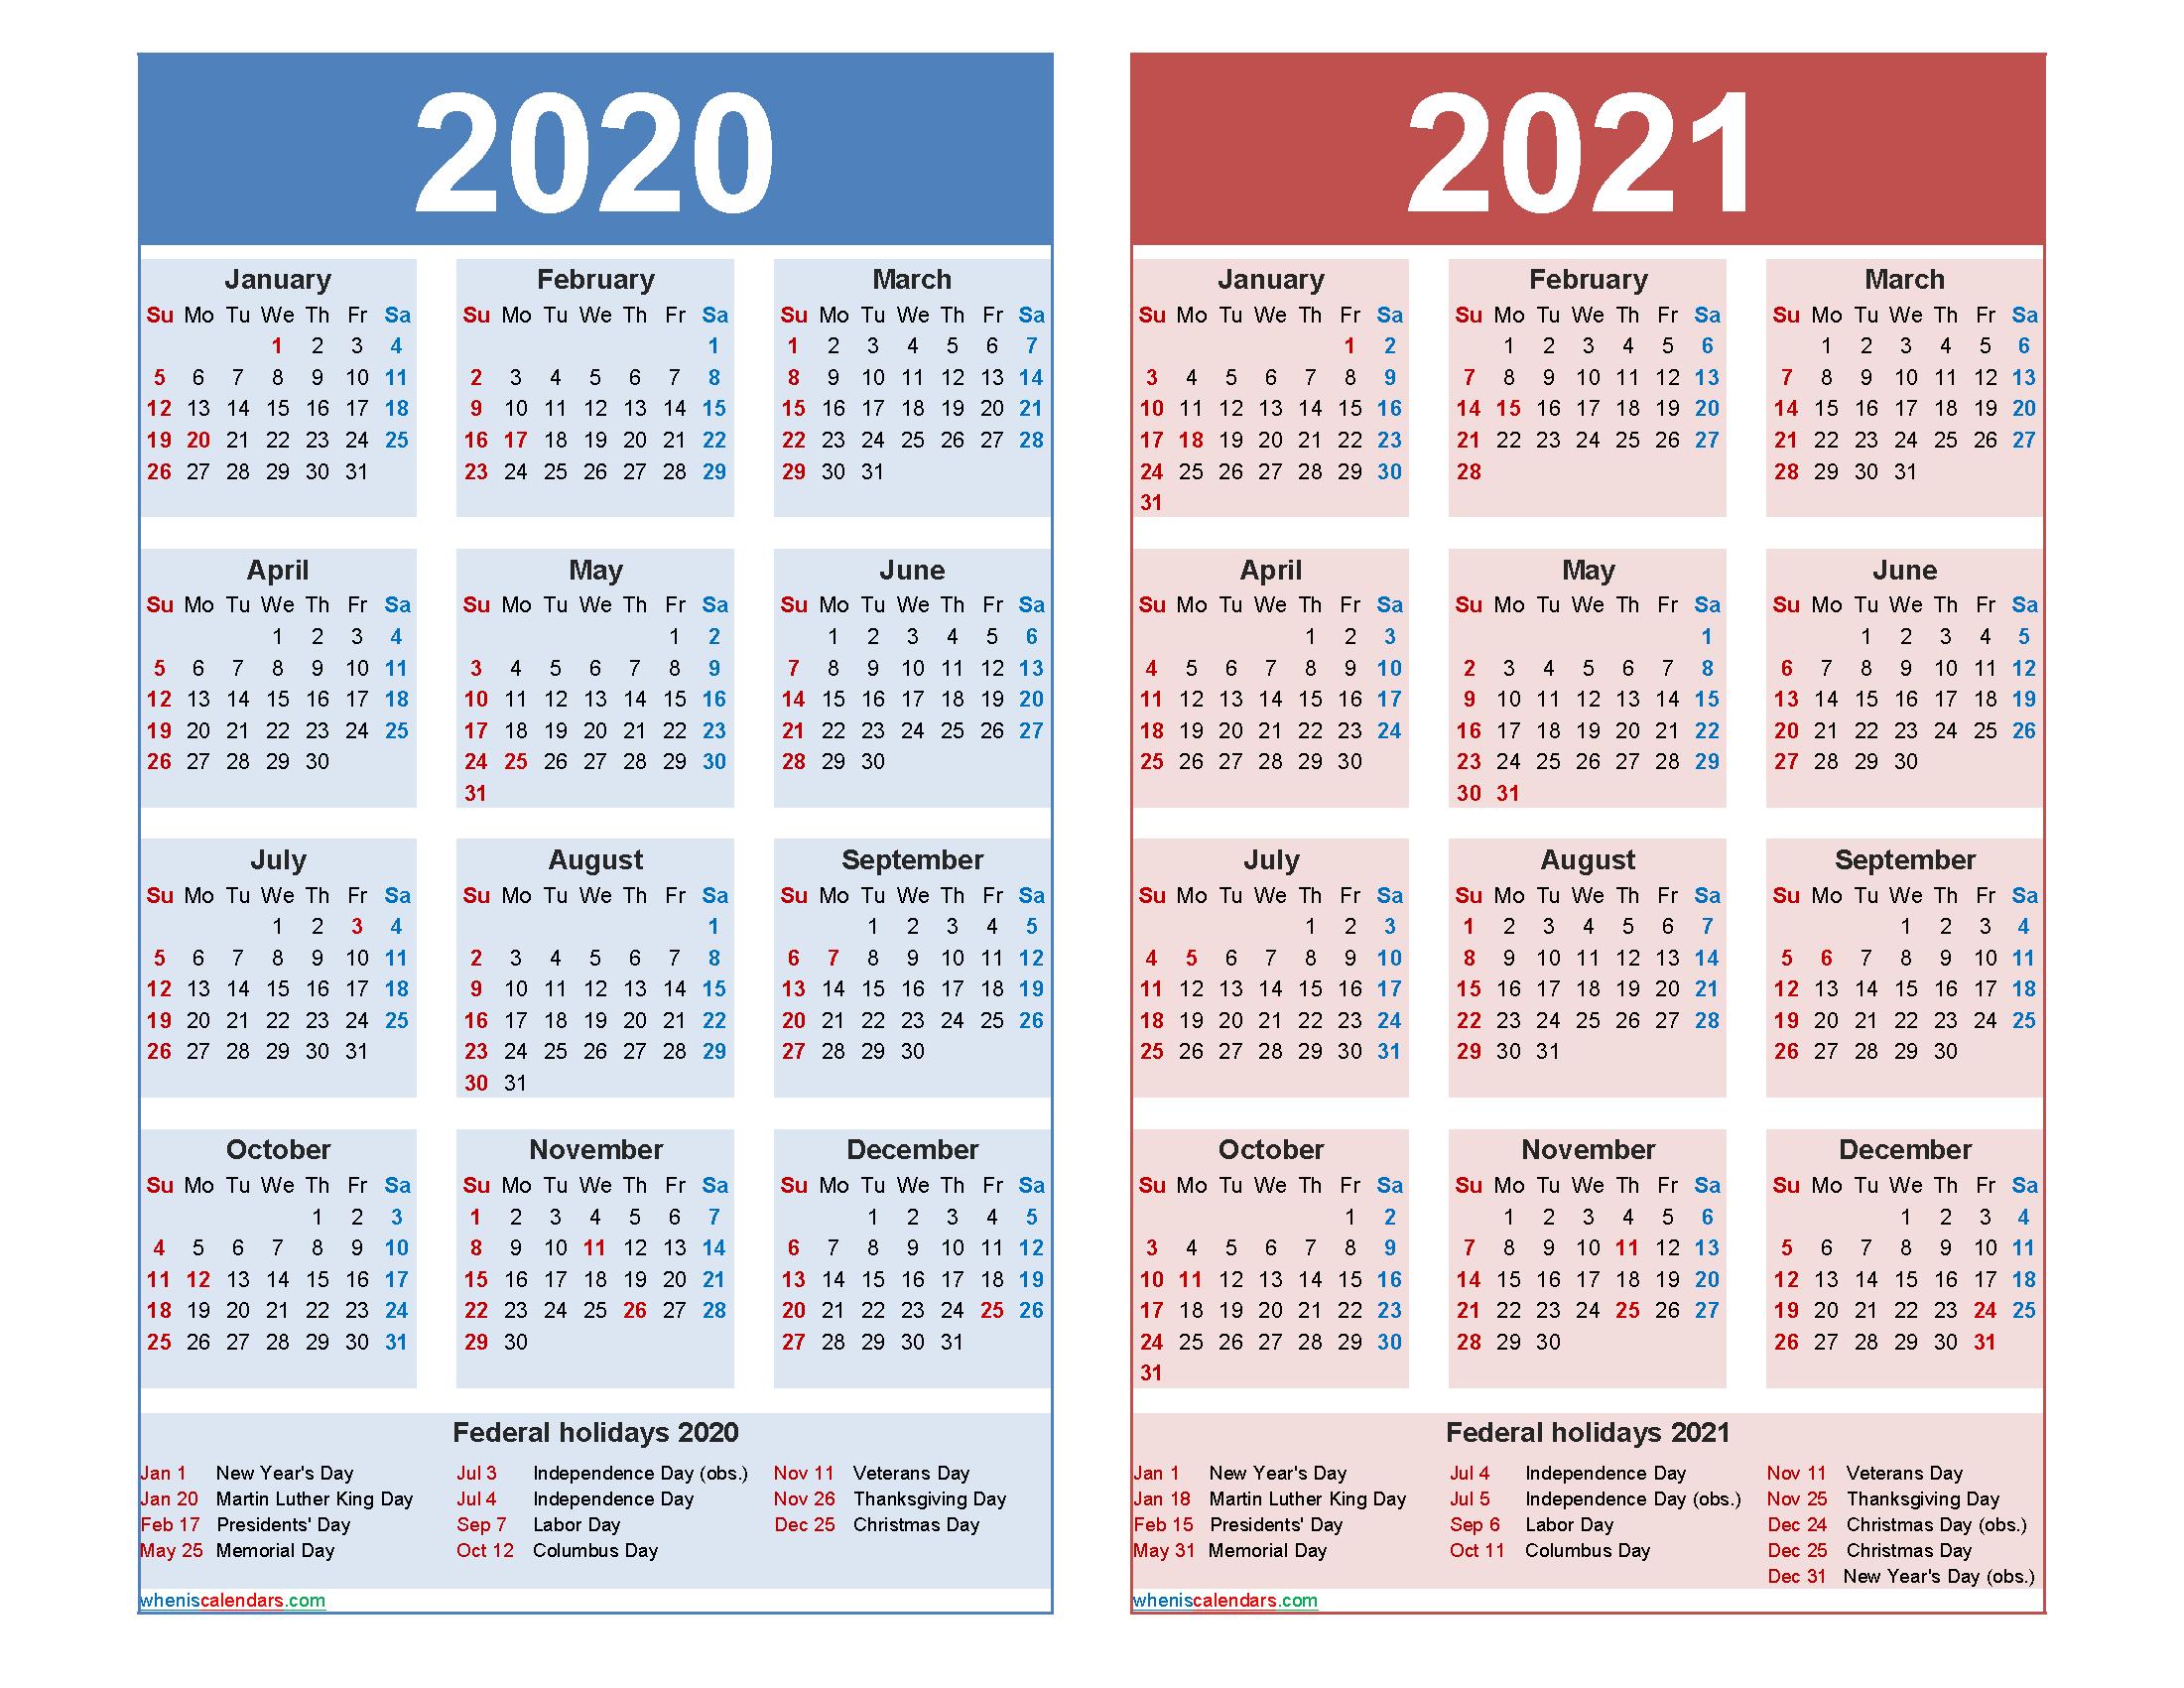 Free 2020 2021 Calendar Printable with Holidays | Free ...